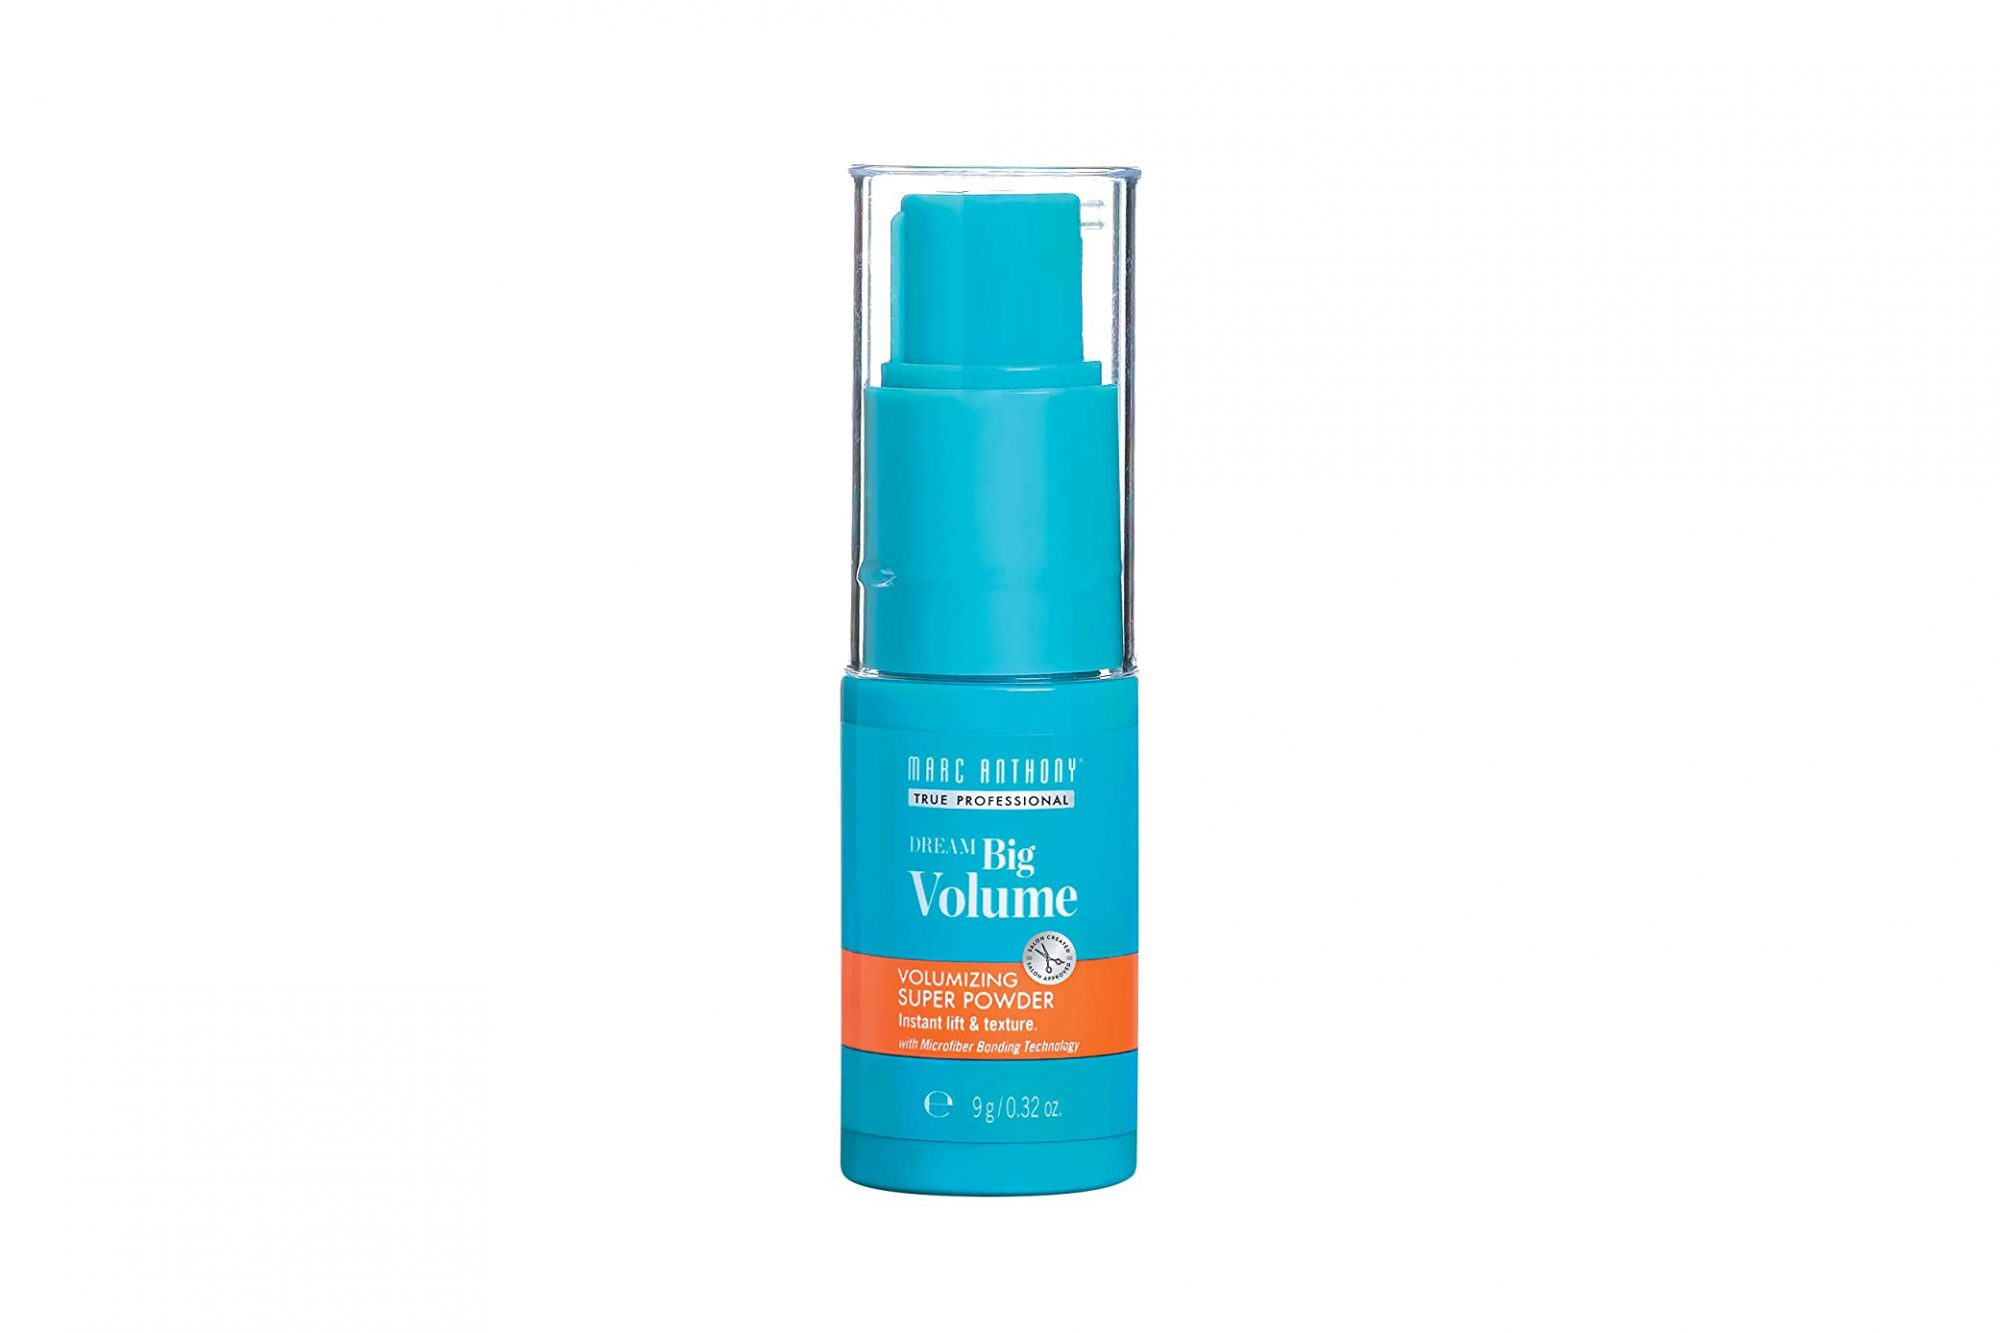 volumizing hair powder Marc Anthony